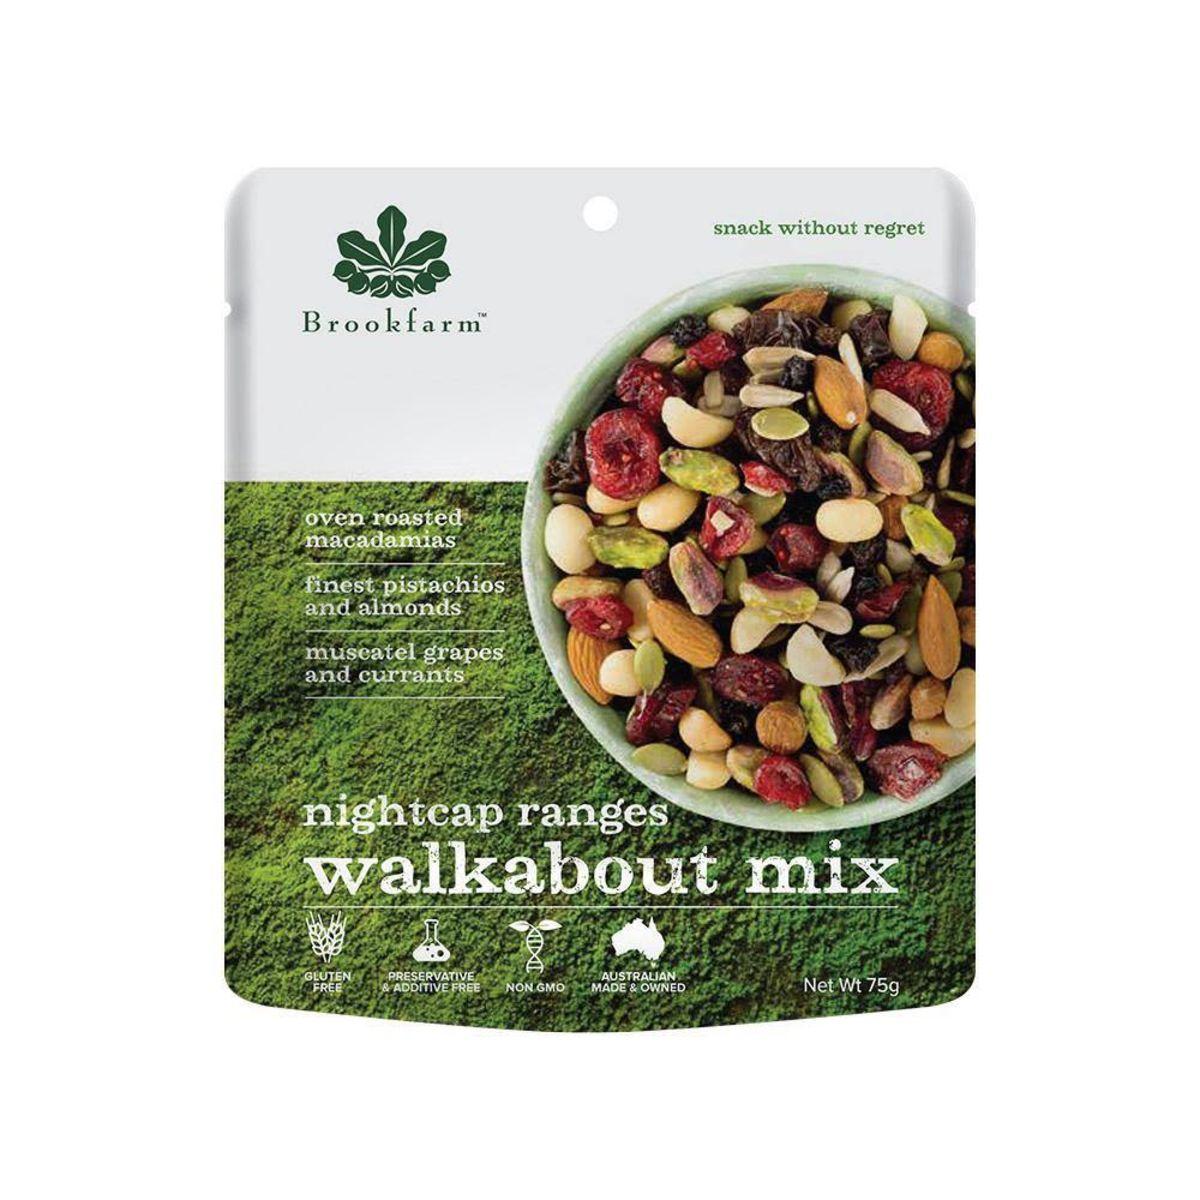 Brookfarm - Walkabout Mix - Nightcap Ranges